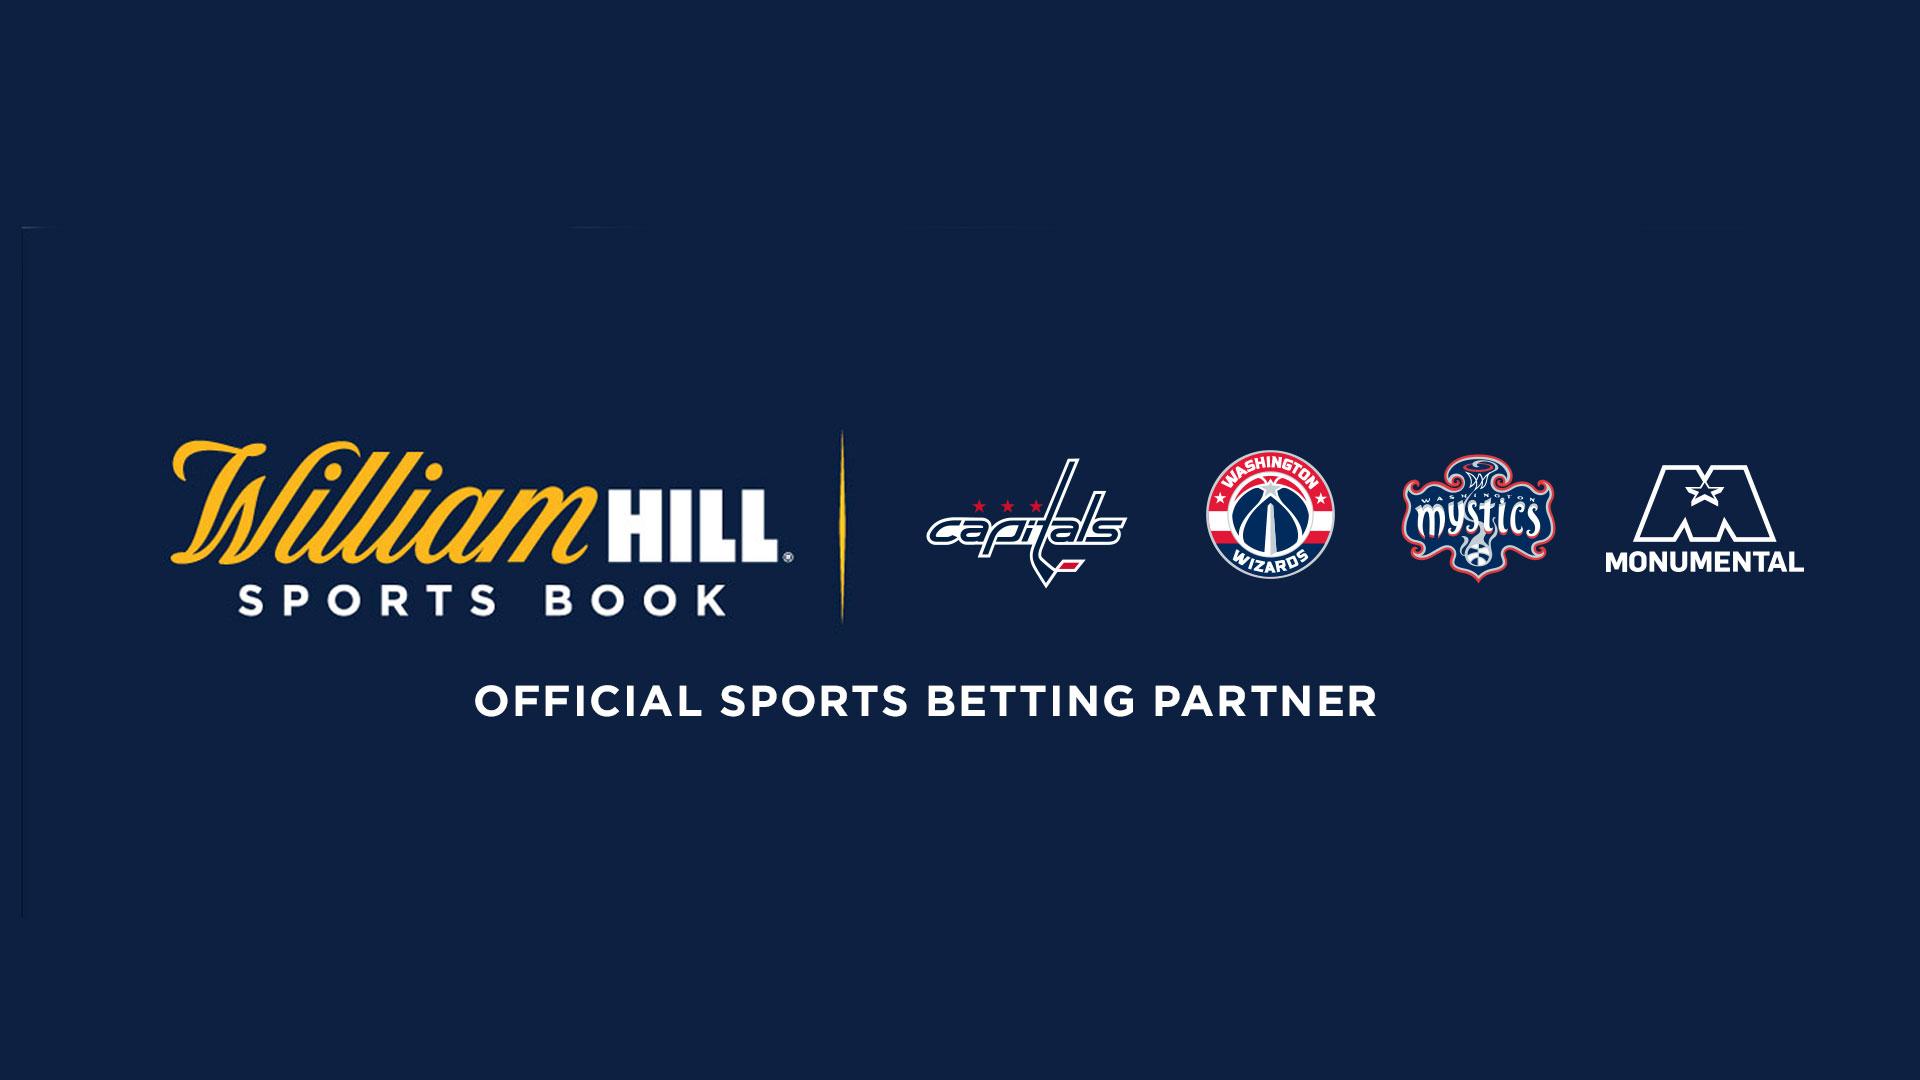 sports betting partnership